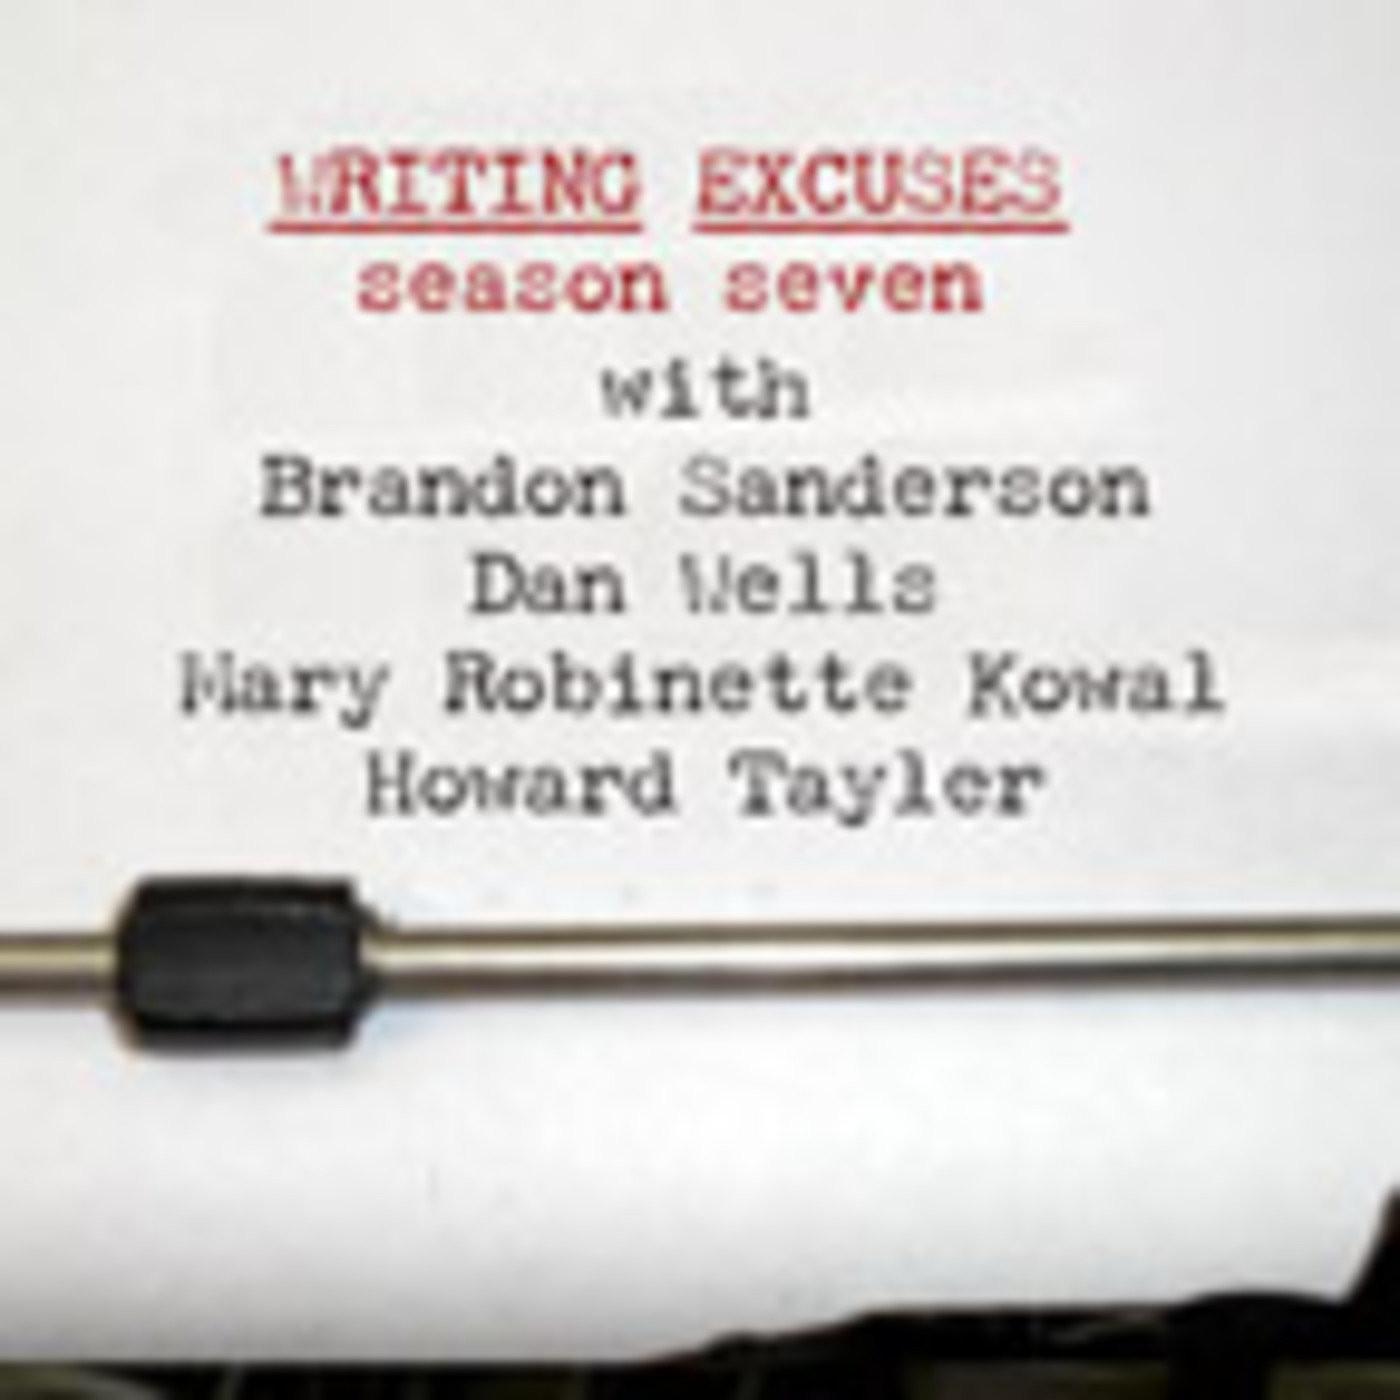 writing excuses season 2